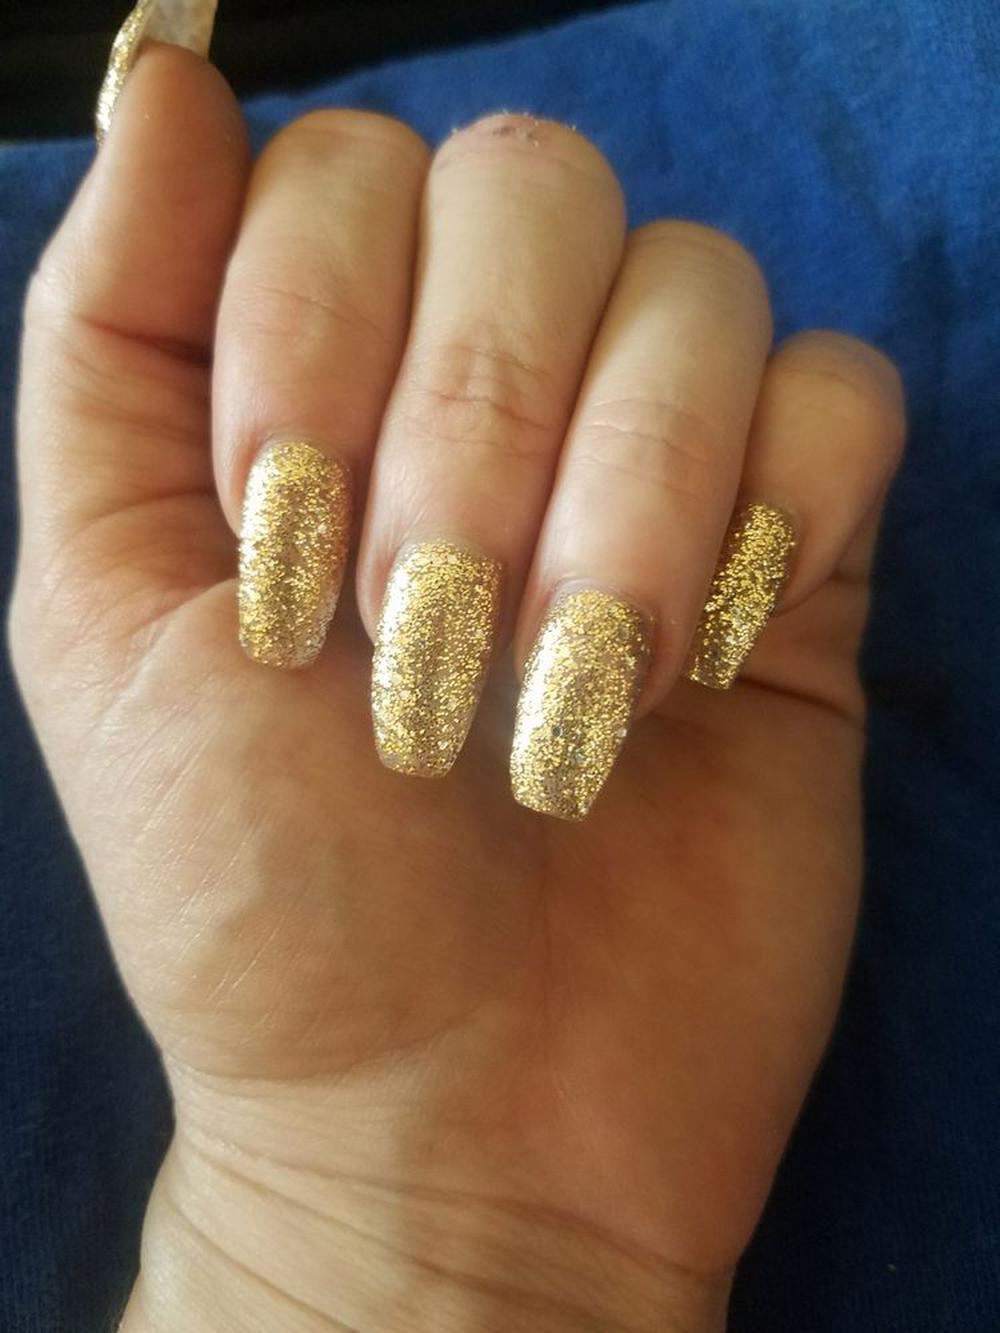 Golden Dragon Nails & Spa